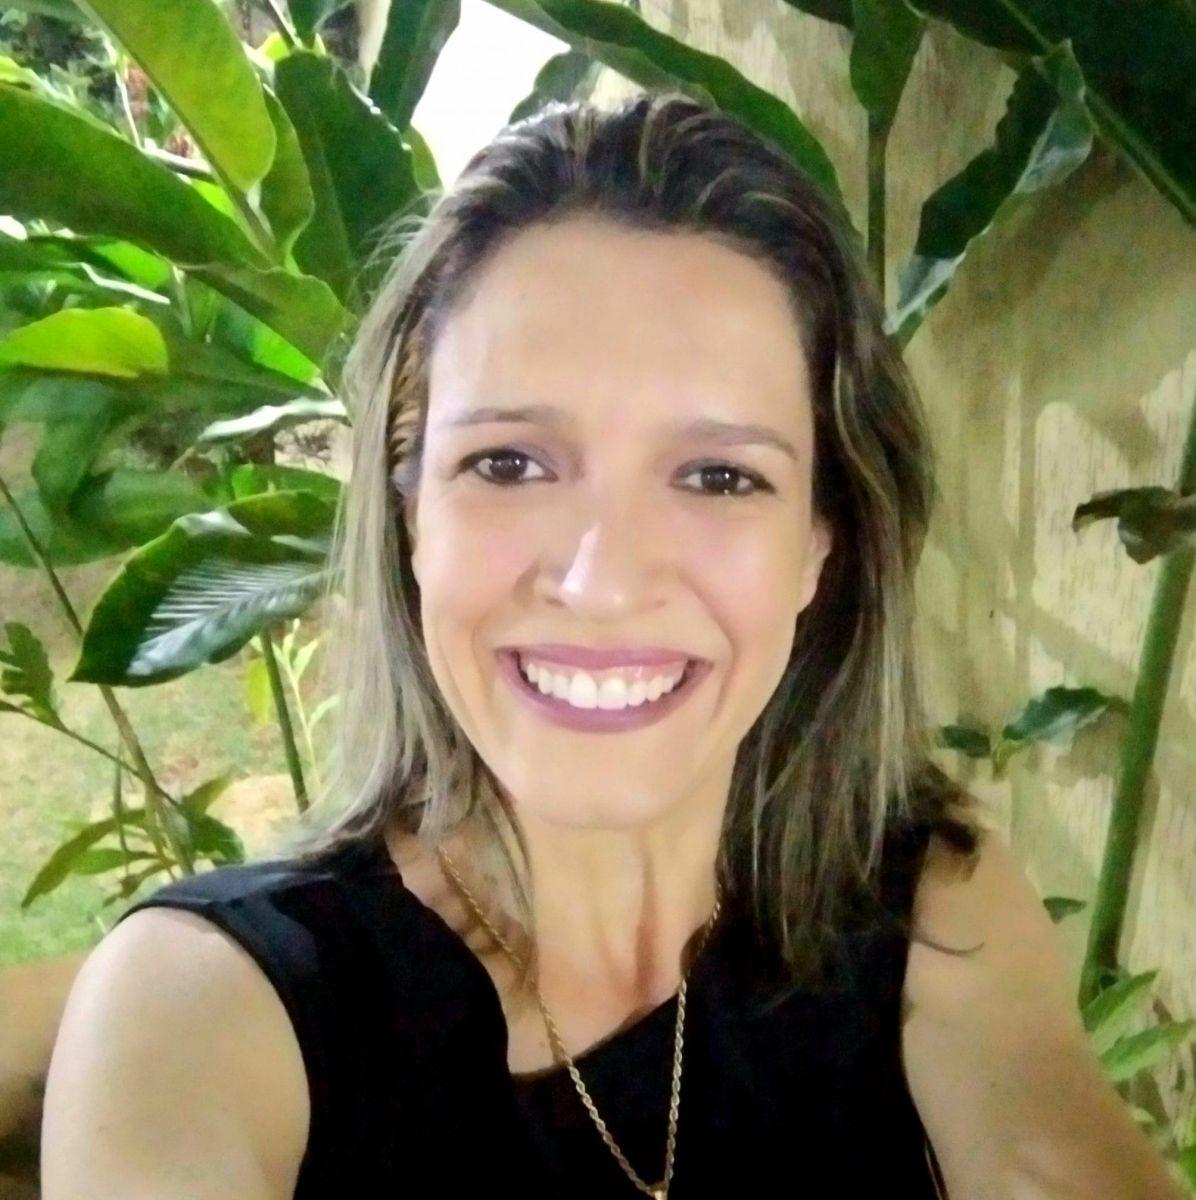 Marisa Peres - Patos de Minas